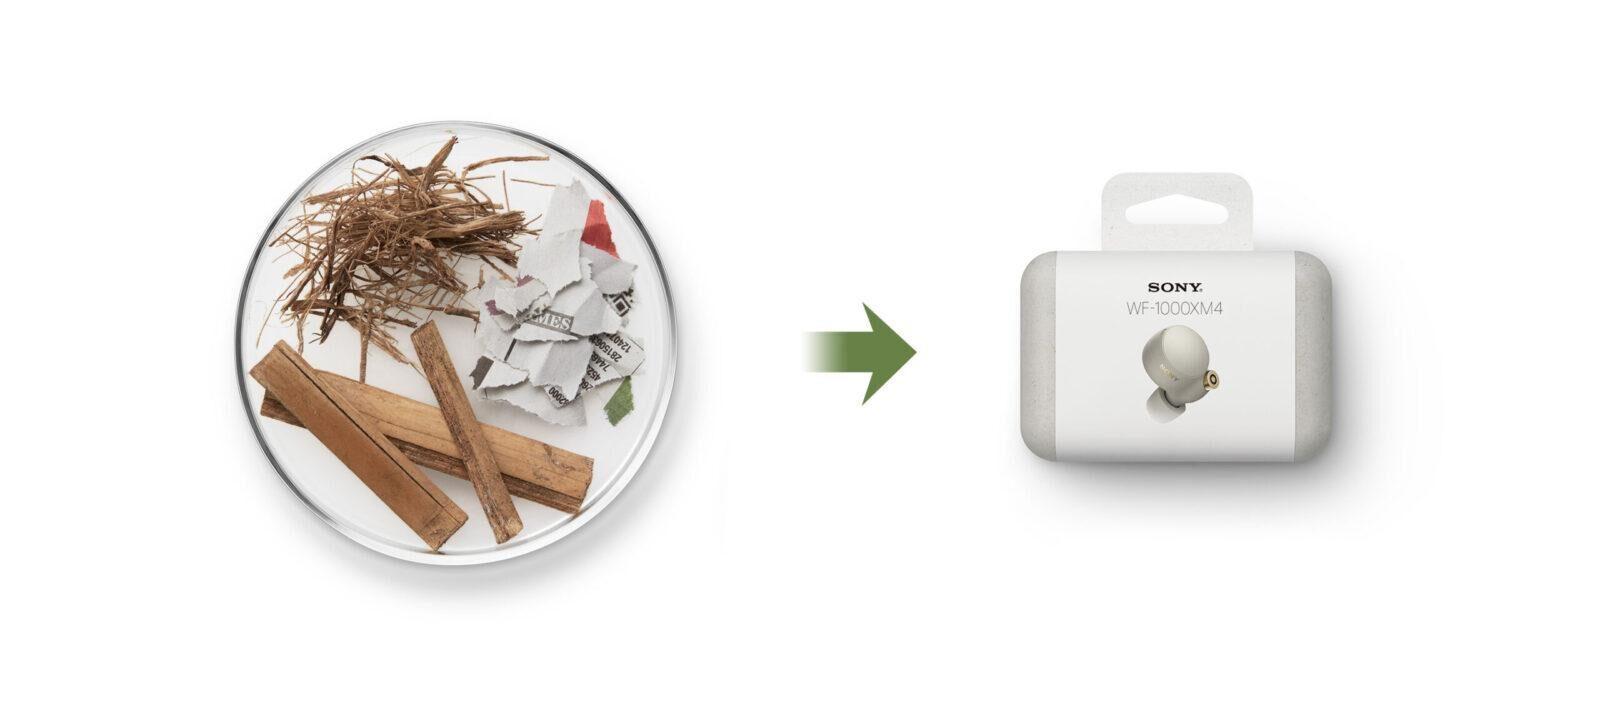 Компания Sony разработала экологически чистый бумажный материал (syre sleva i gotovaya upakovka sprava scaled)